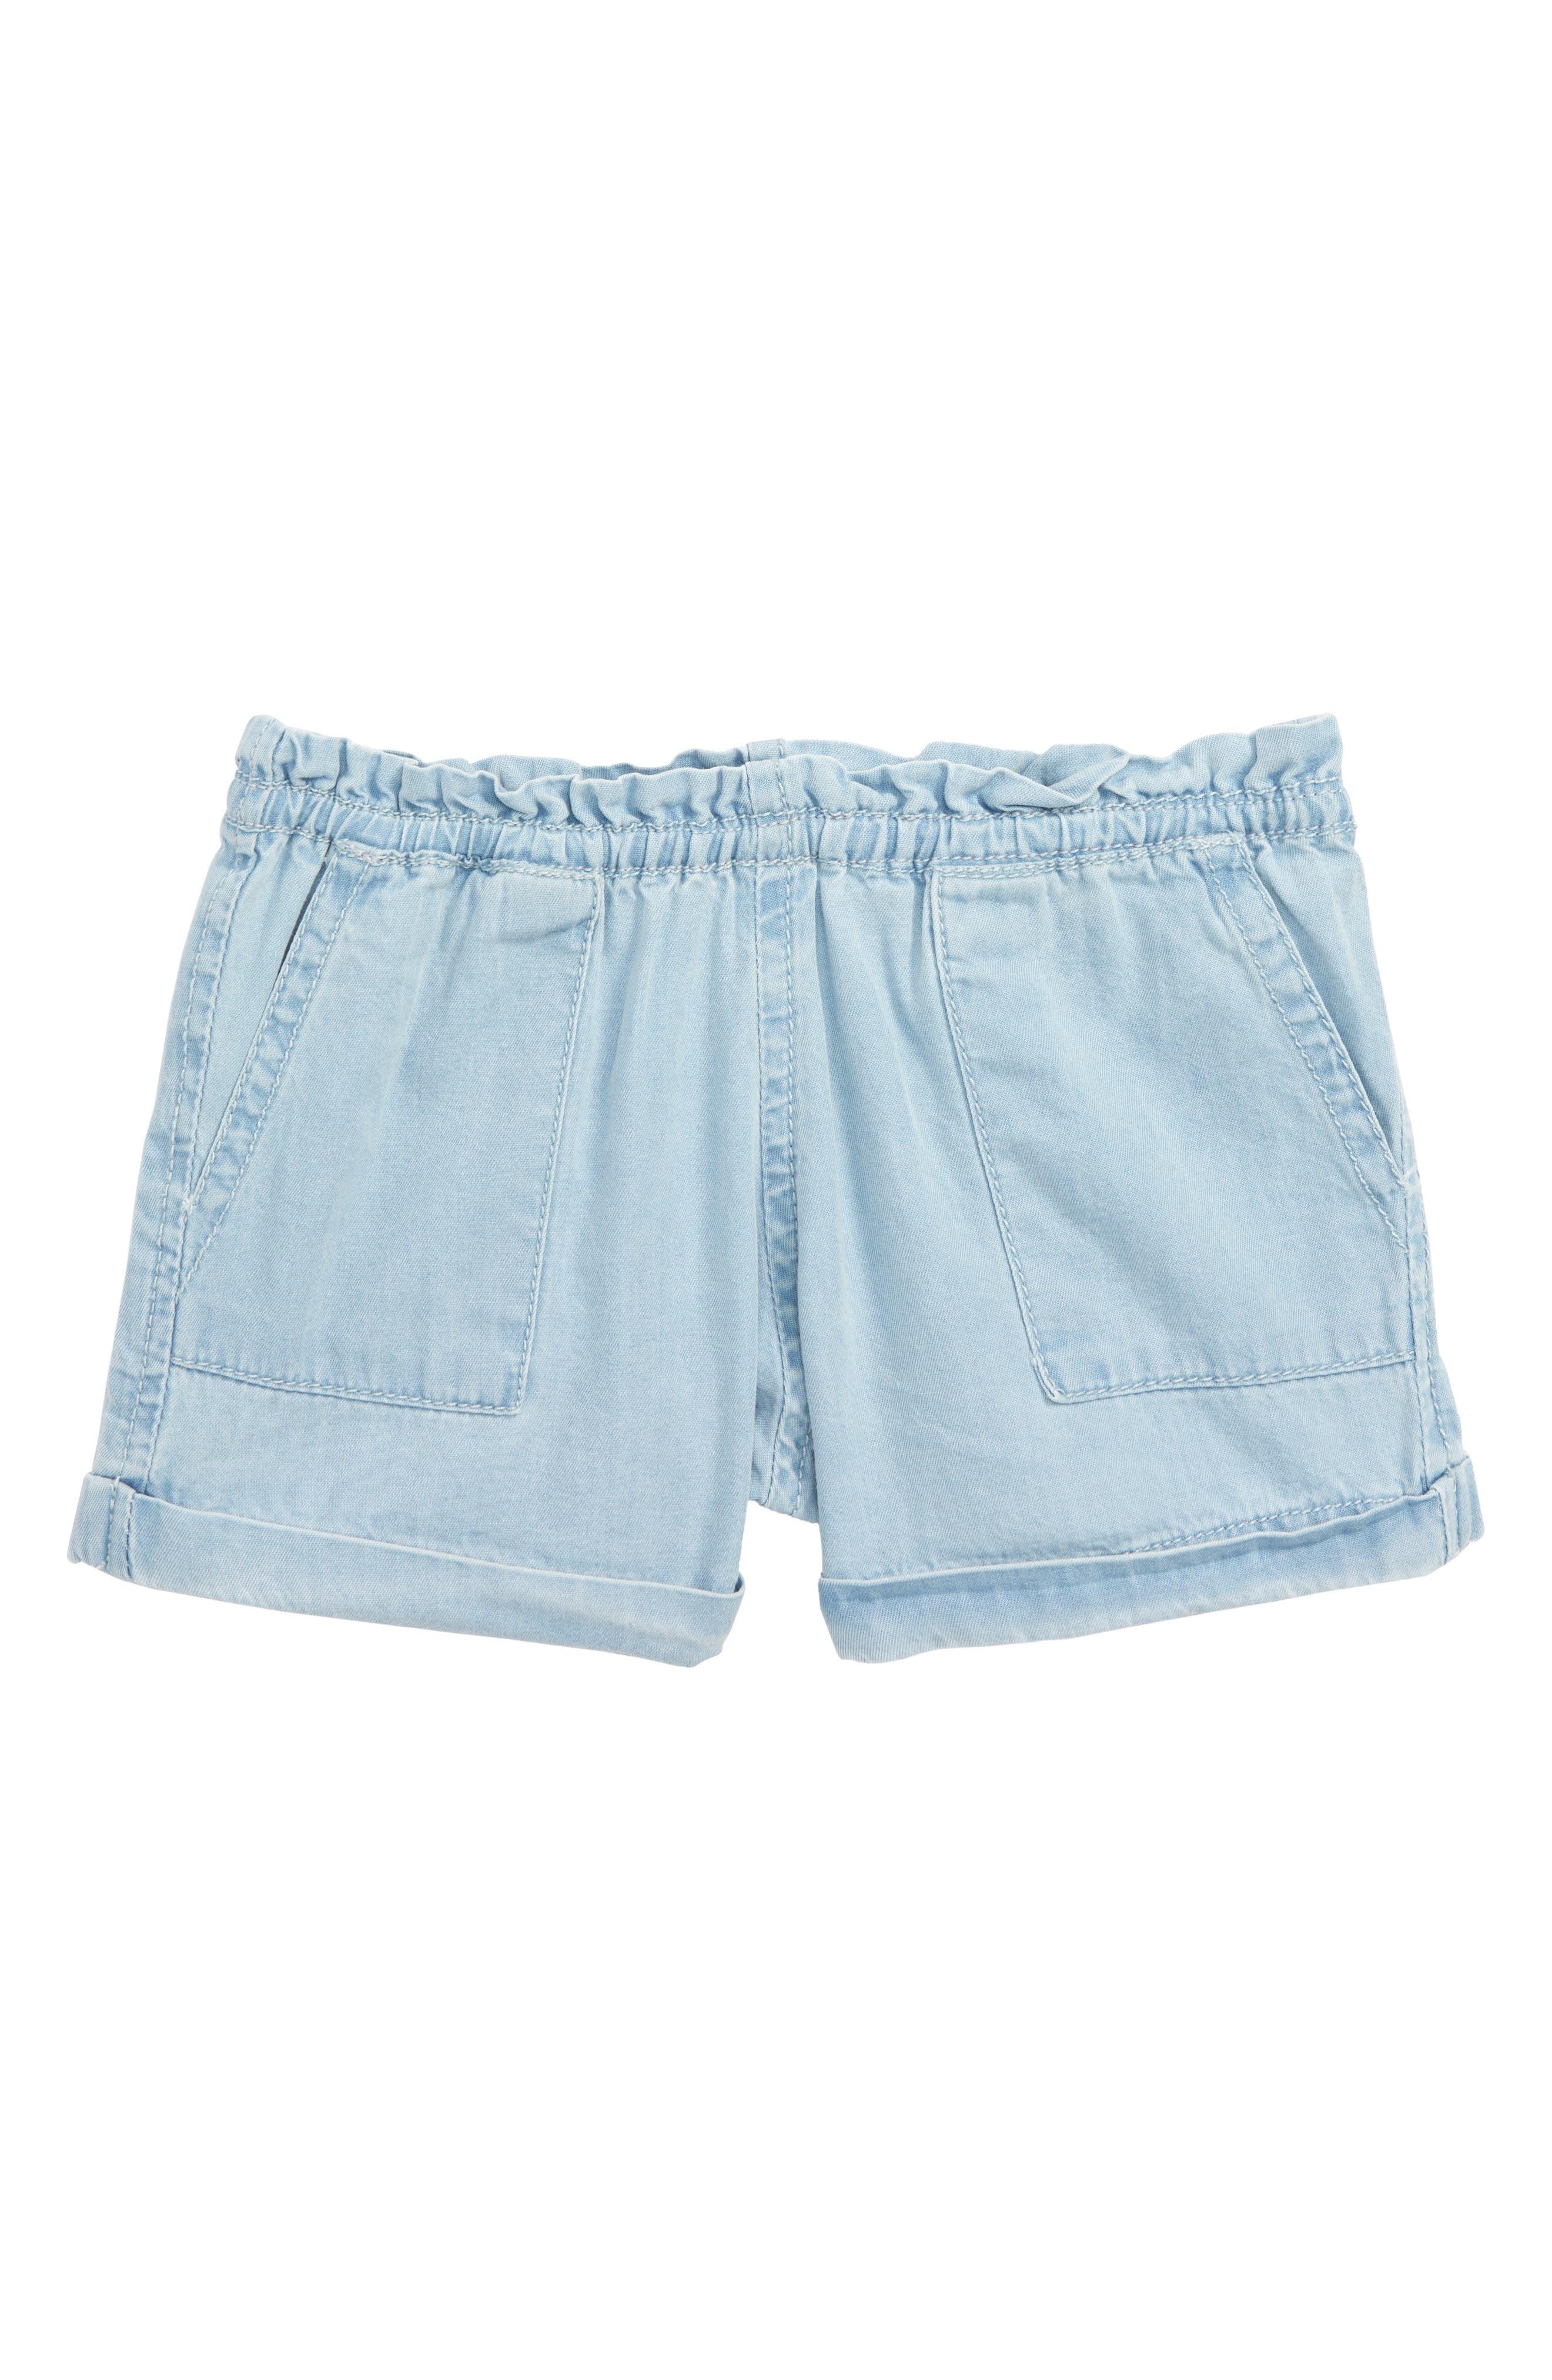 Jojo Chambray Shorts,                         Main,                         color, Chambray